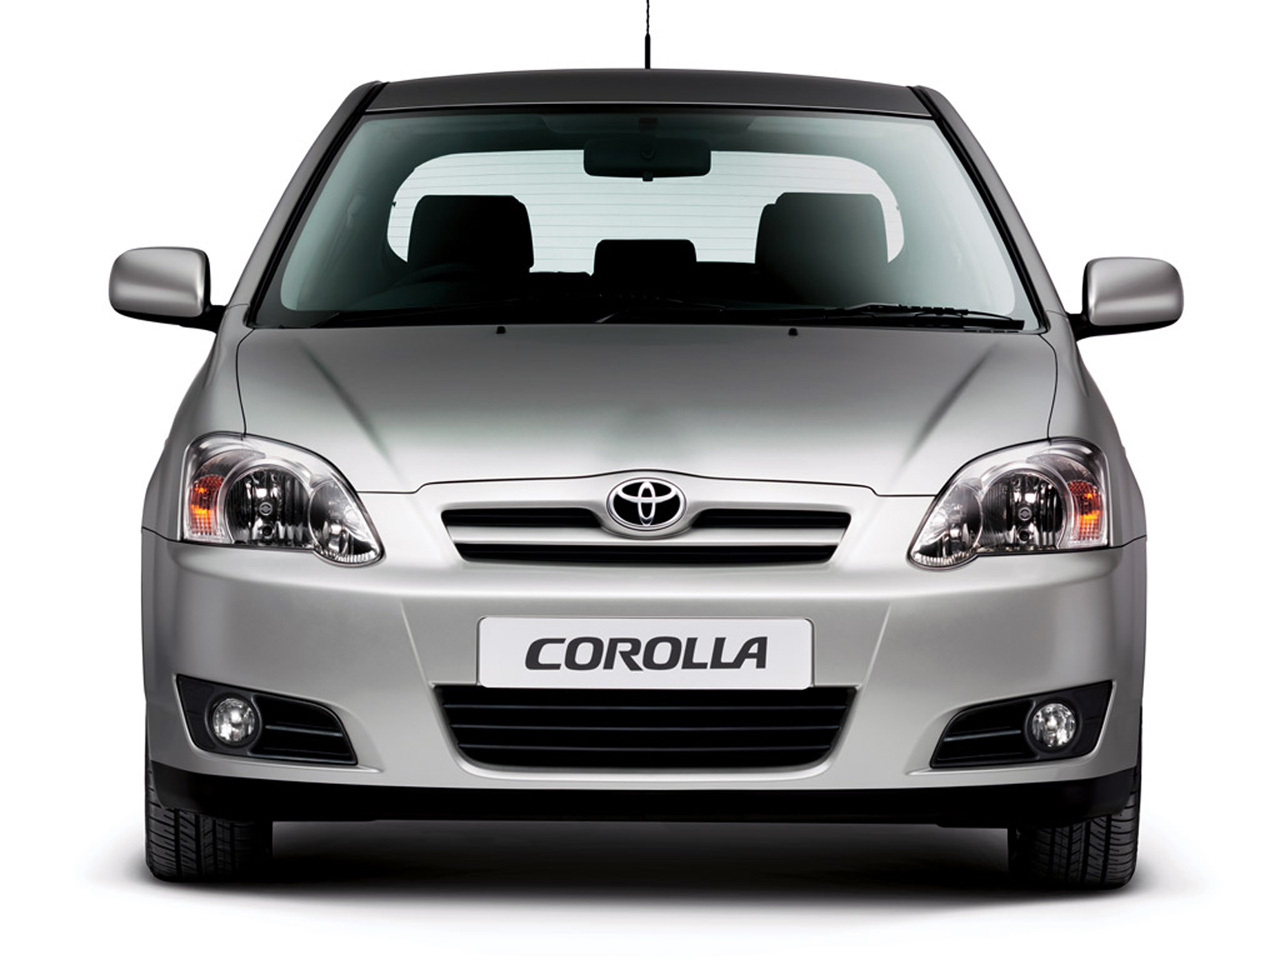 TOYOTA Corolla (HB) 2001-2006